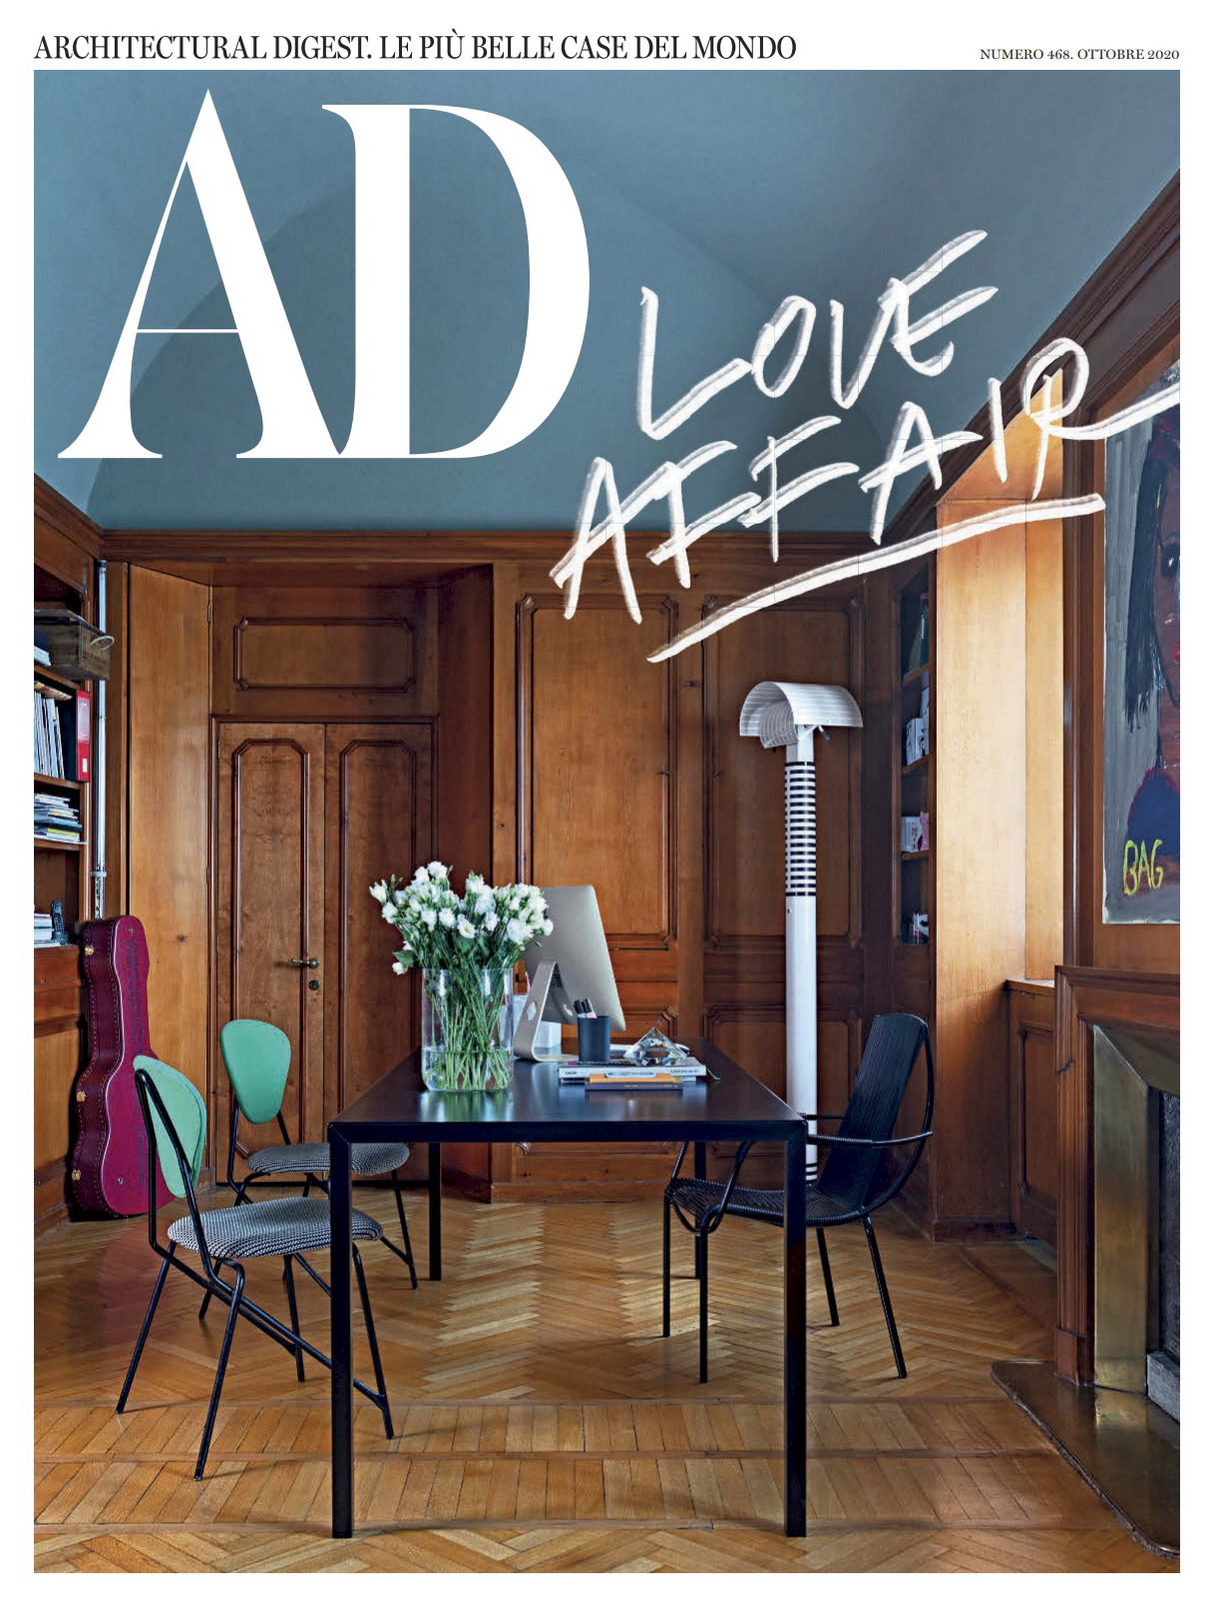 《AD》意大利版室内室外设计杂志2020年10月号